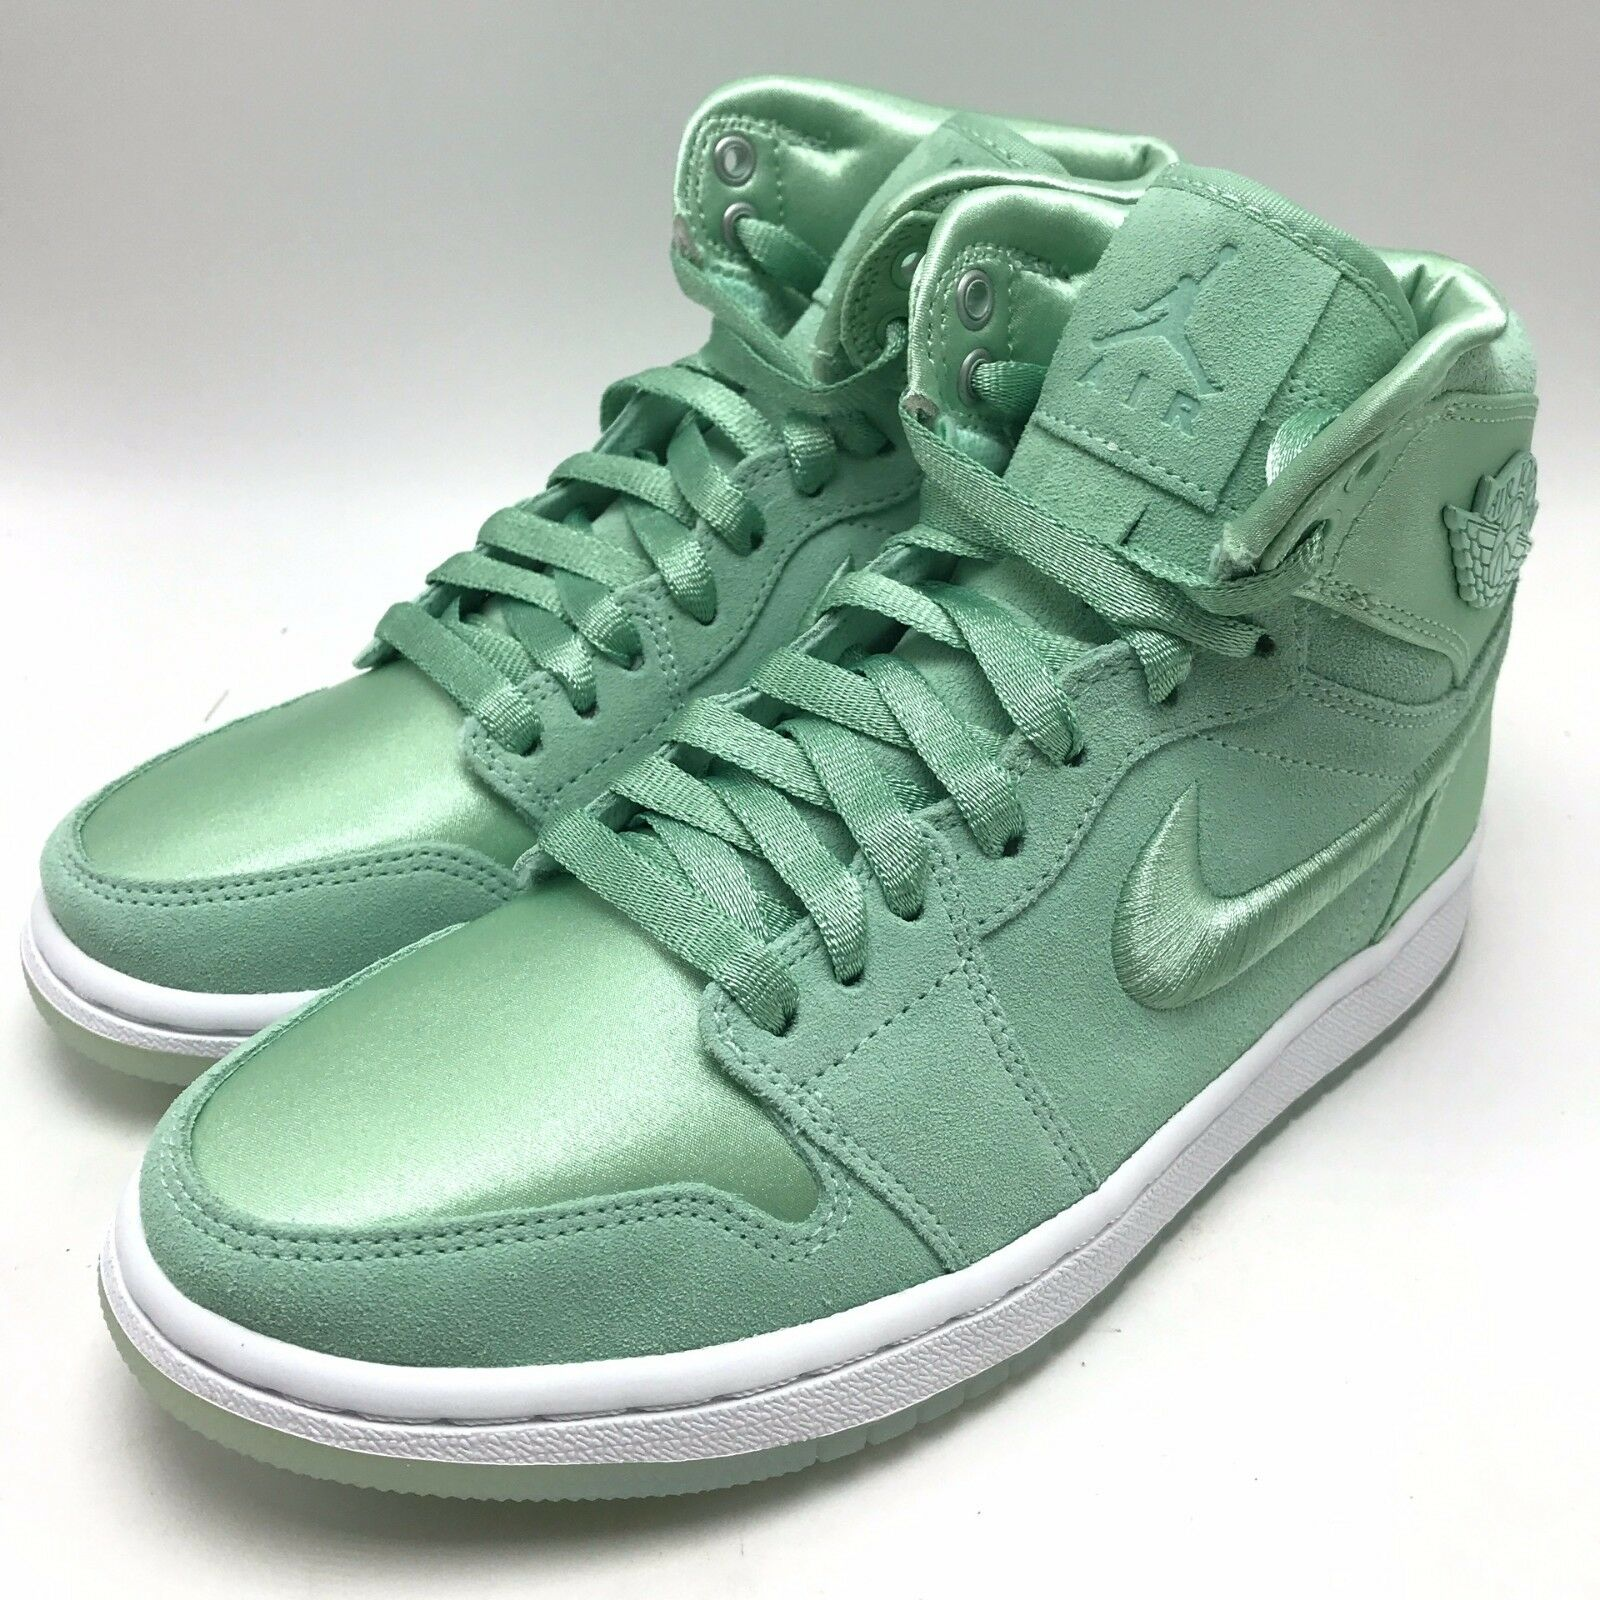 Nike Air Jordan 1 Retro High SOH Women's shoes Mint Metallic gold AO1847-345